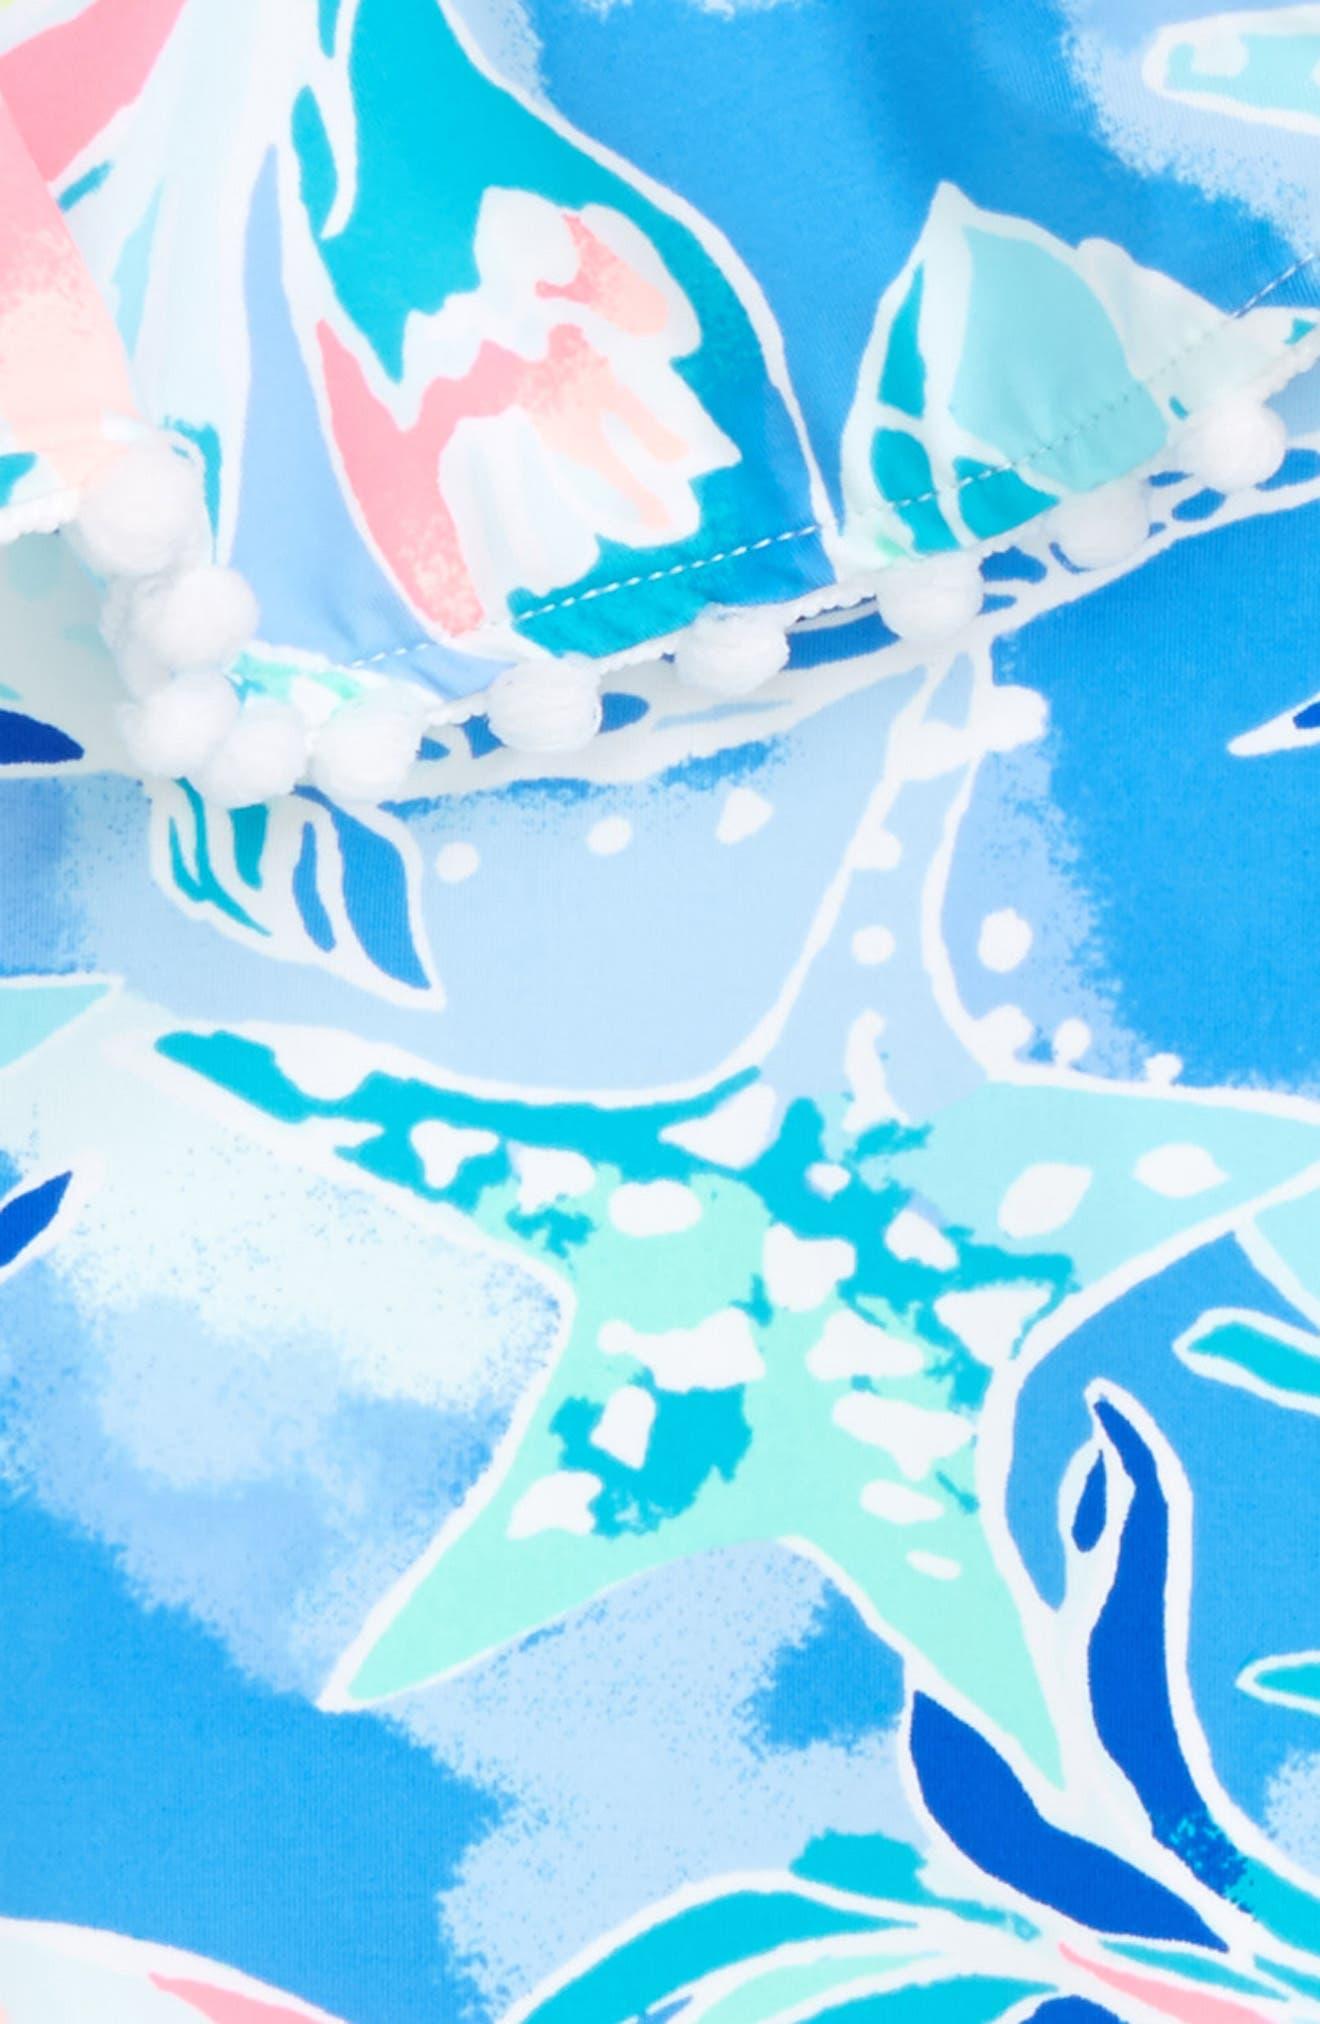 Joni Ruffle One-Piece Swimsuit,                             Alternate thumbnail 2, color,                             Bennet Blue Celestial Seas